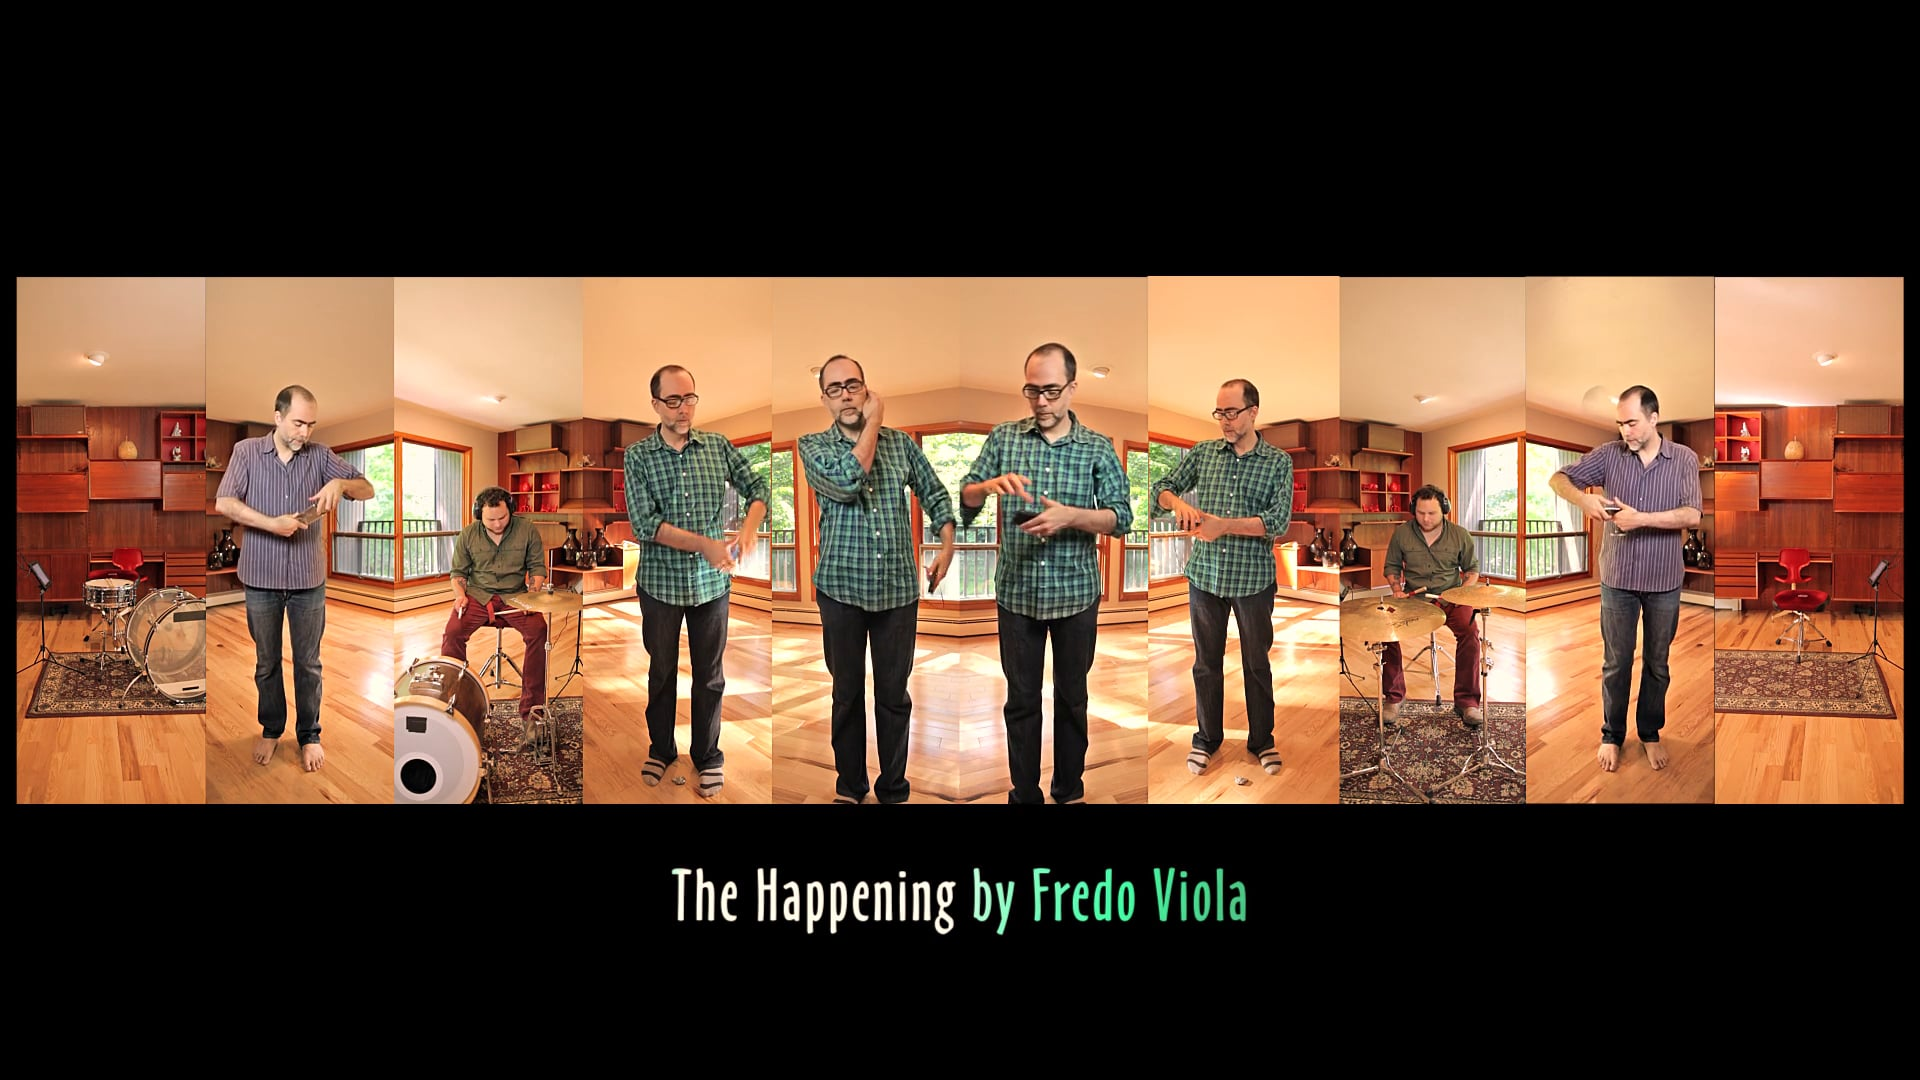 Fredo Viola - The Happening (live cluster video)